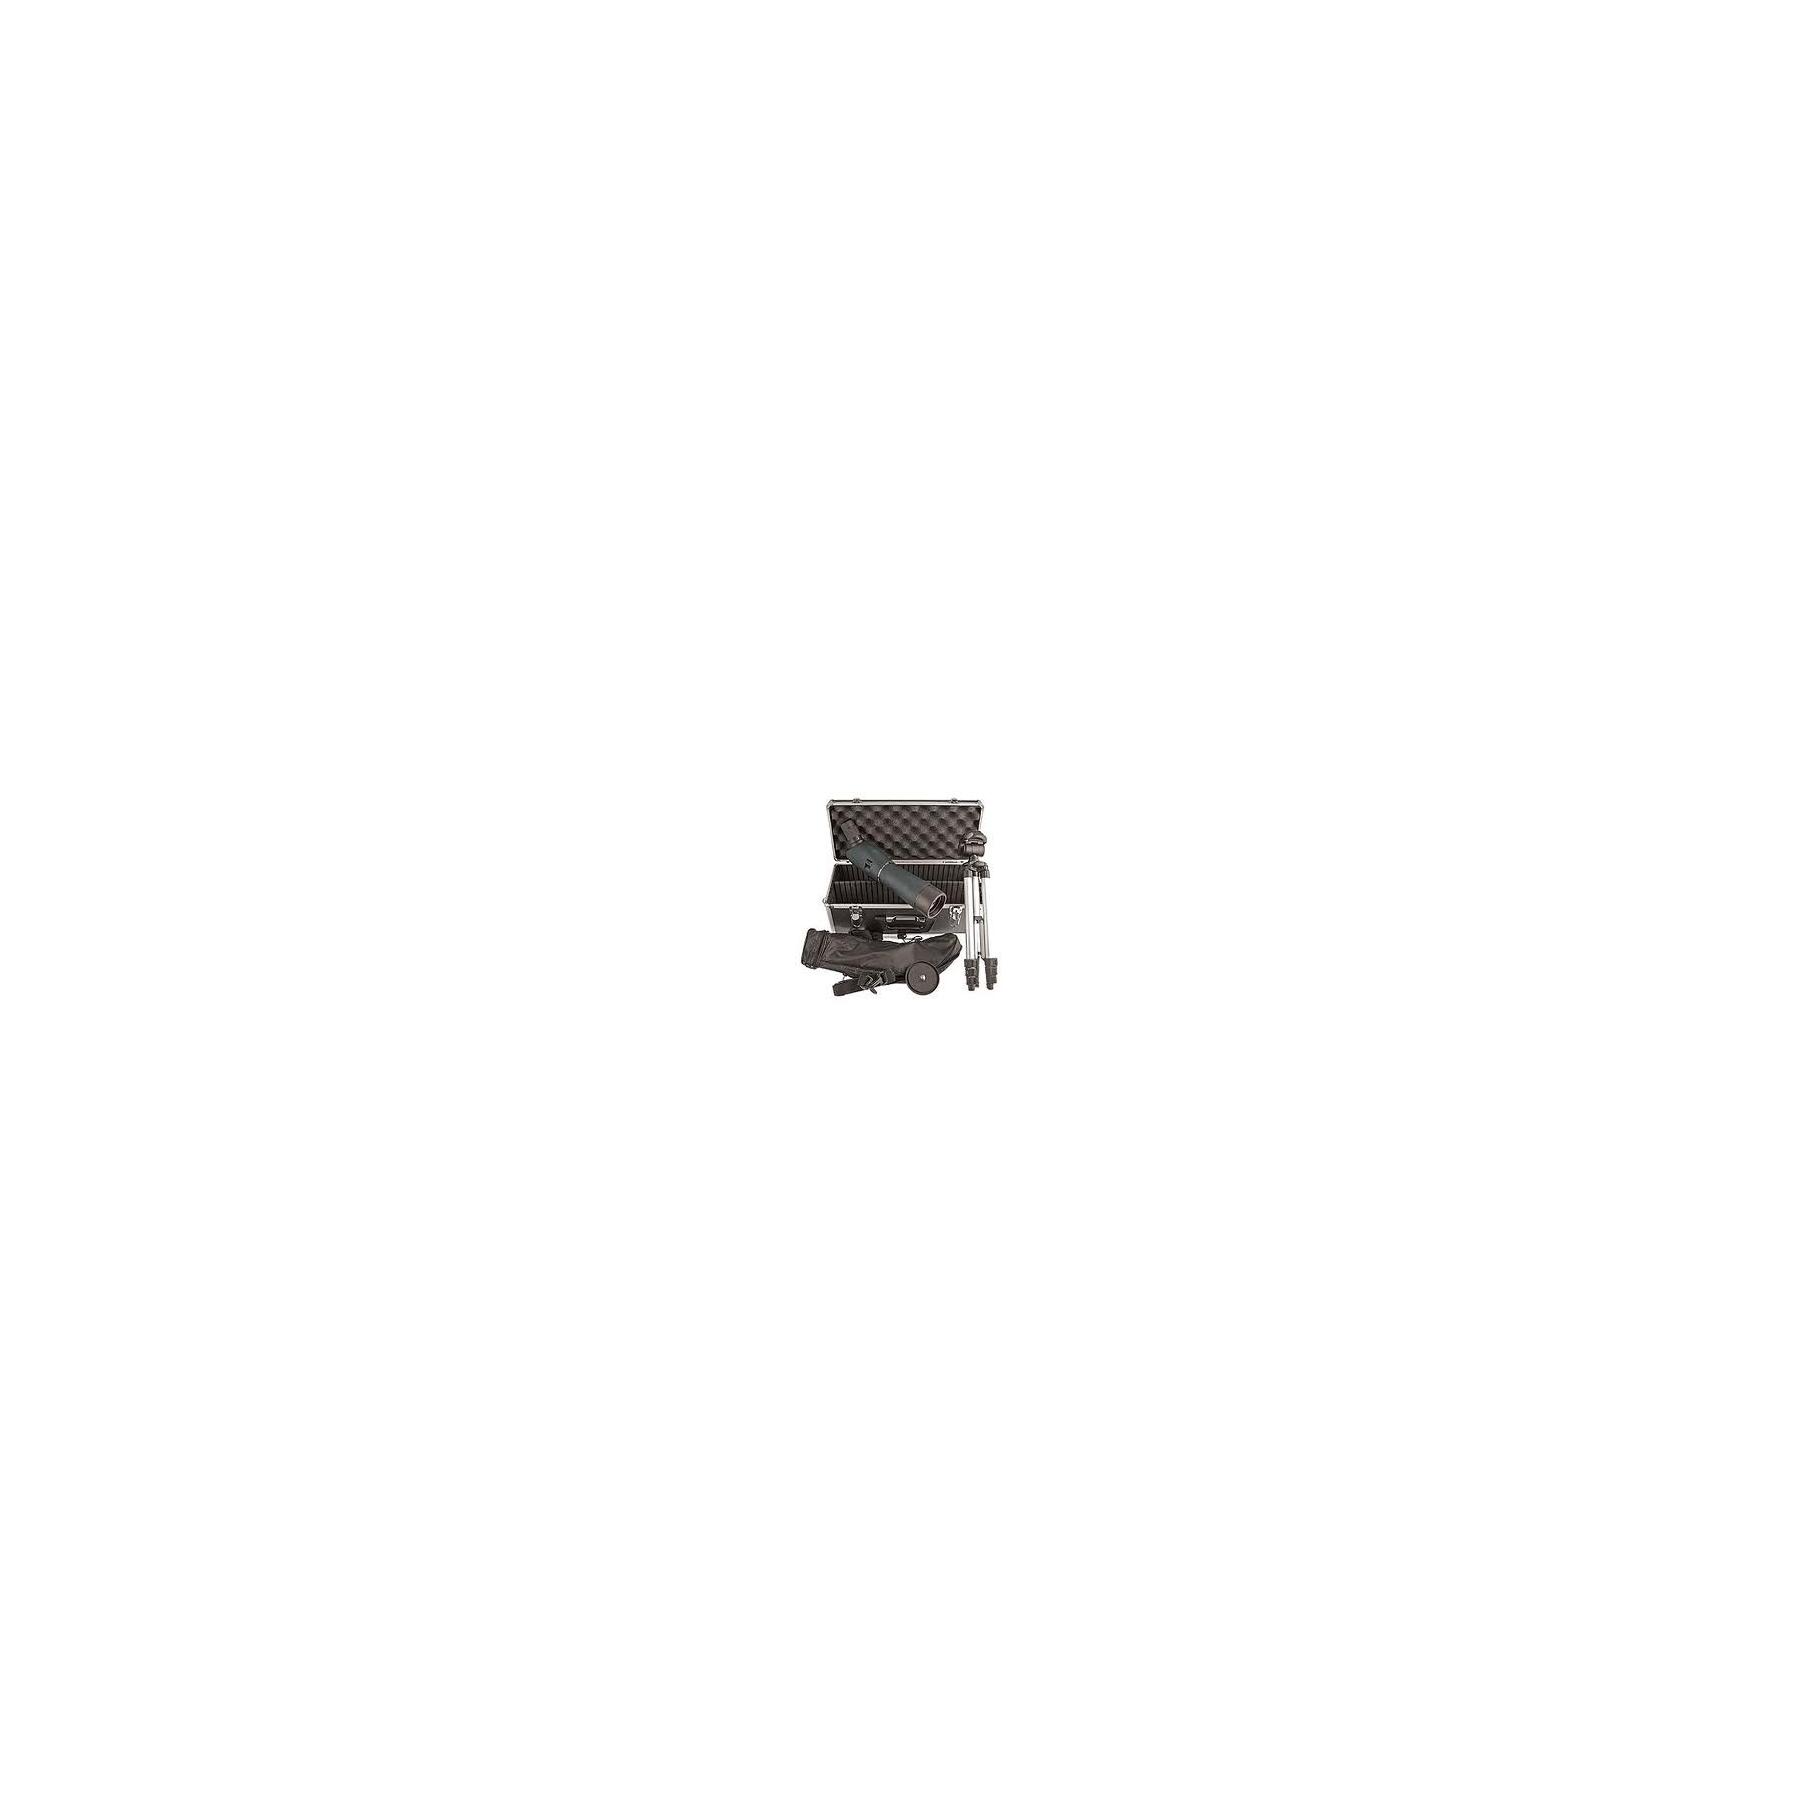 HAWKE OPTIC NATURE 24-72x70